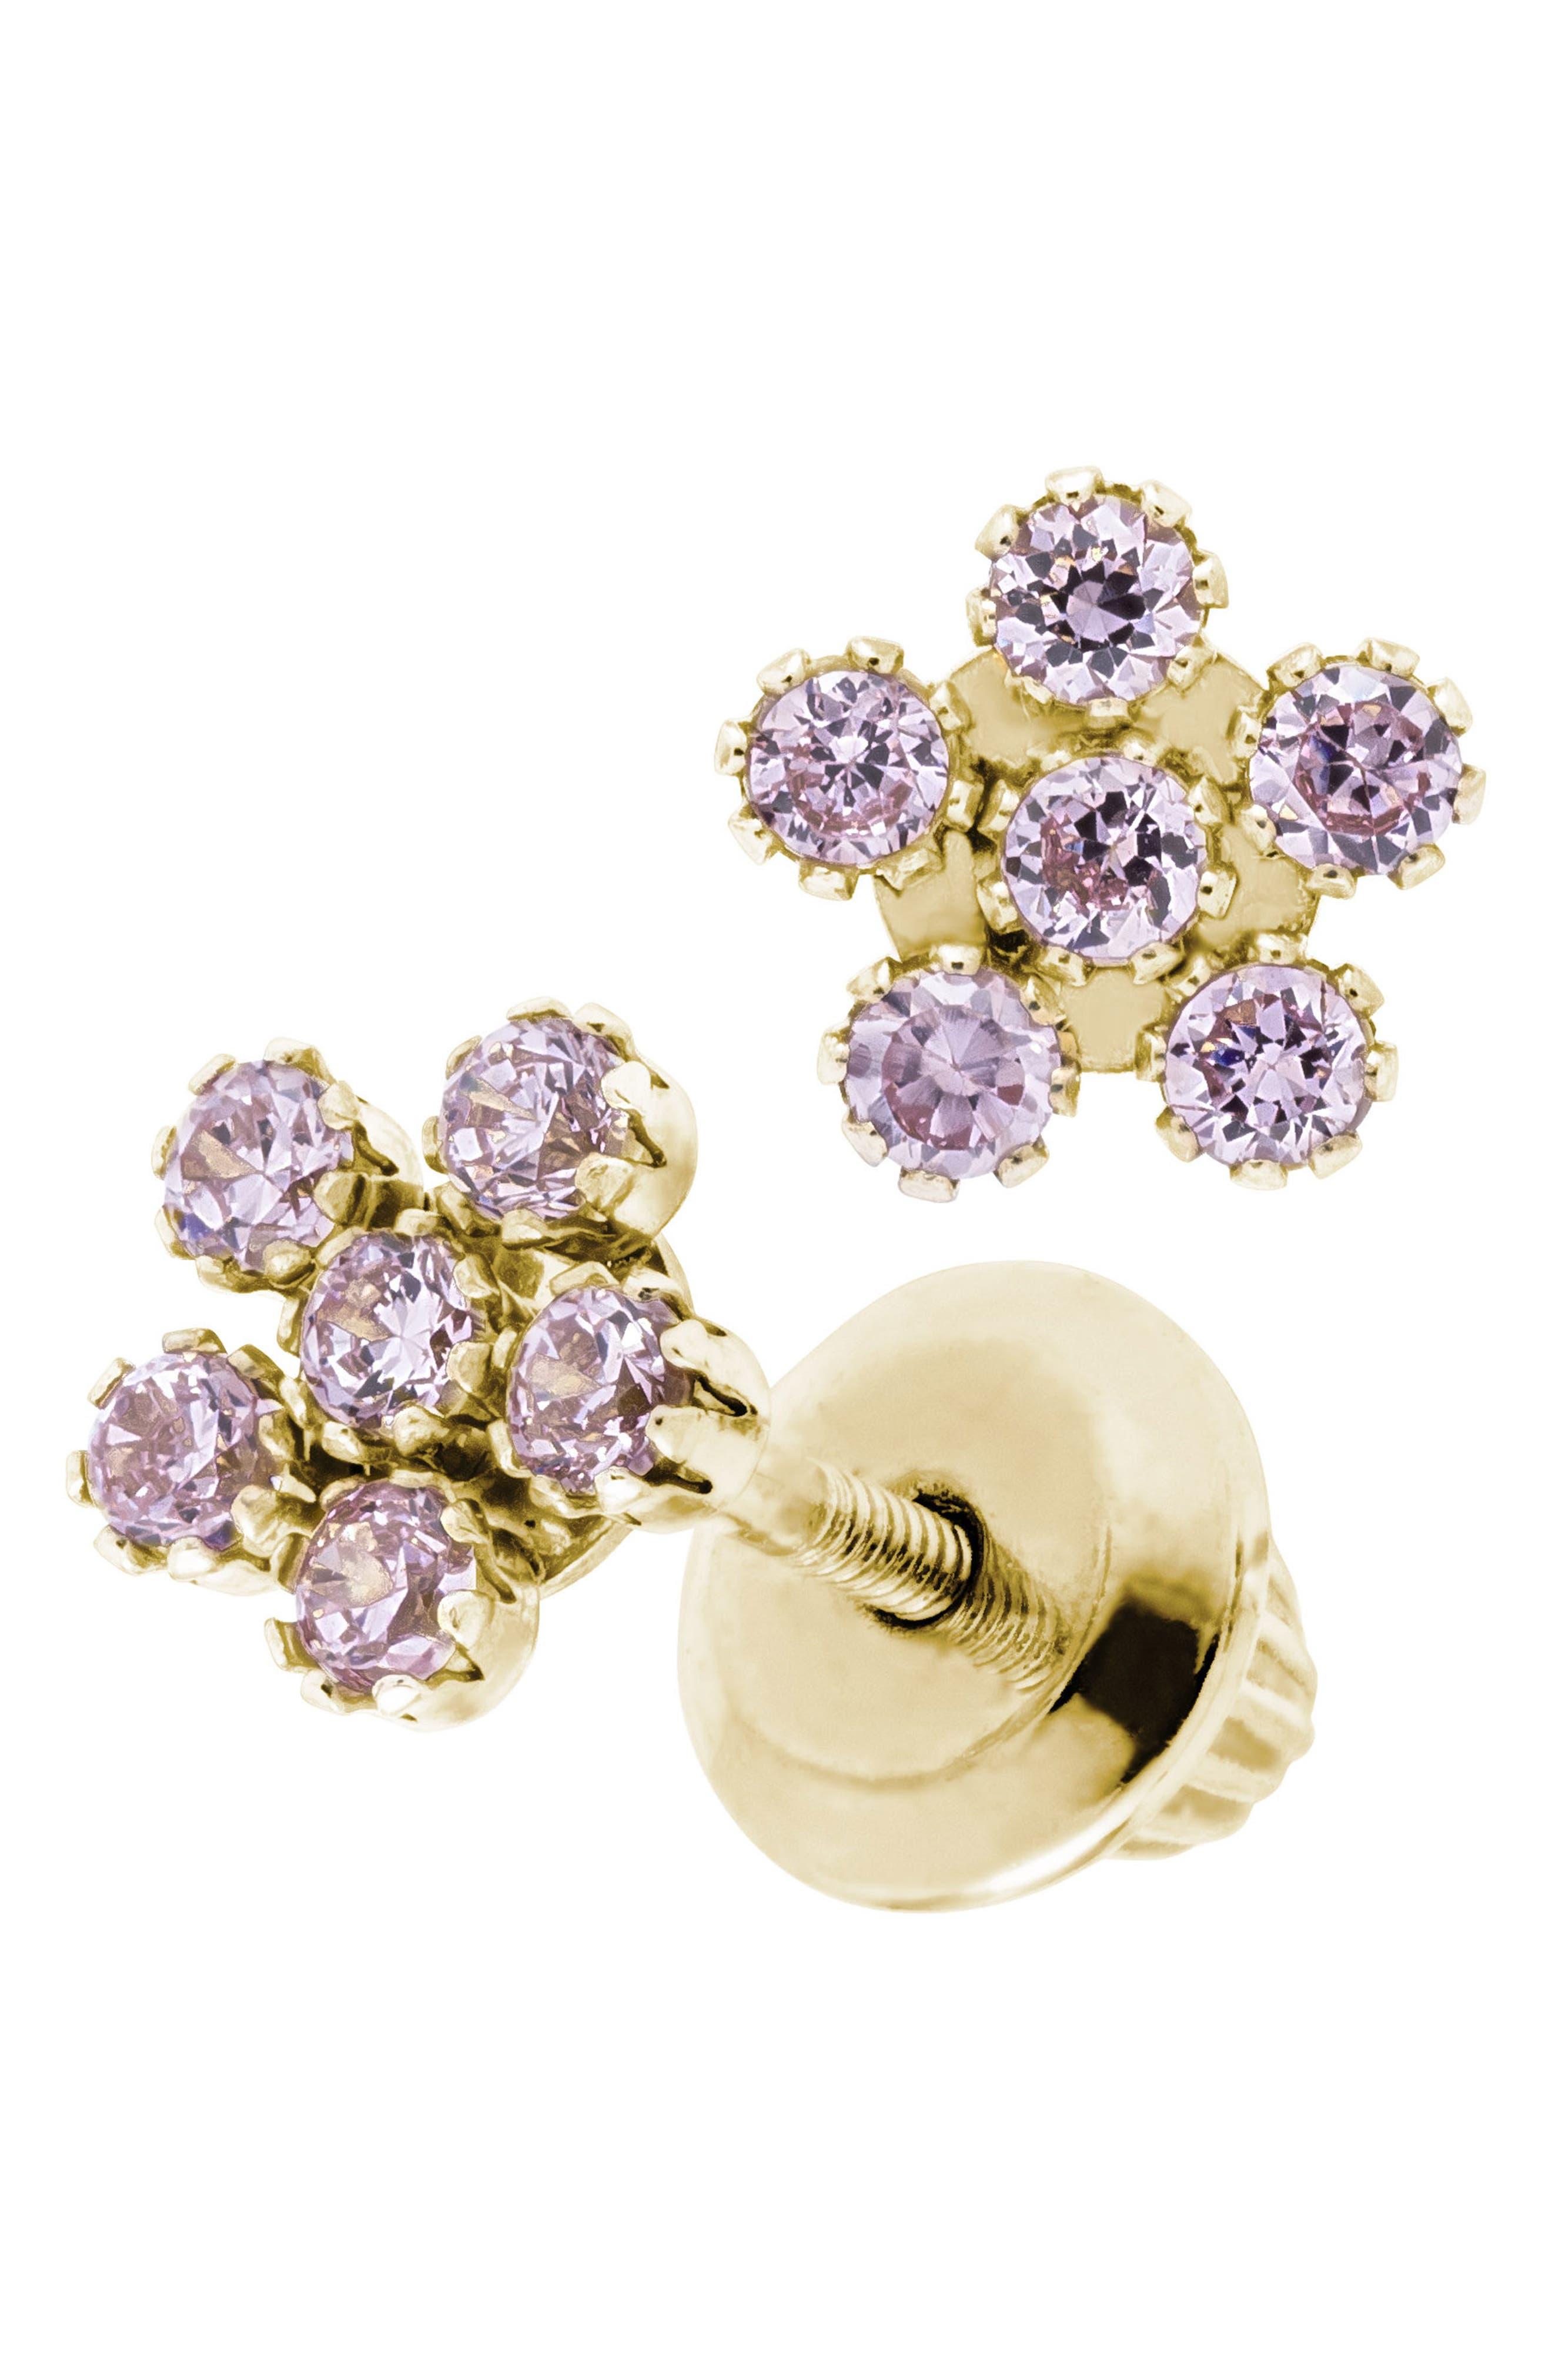 14k Gold & Cubic Zirconia Flower Earrings,                             Alternate thumbnail 2, color,                             Pink/ Gold